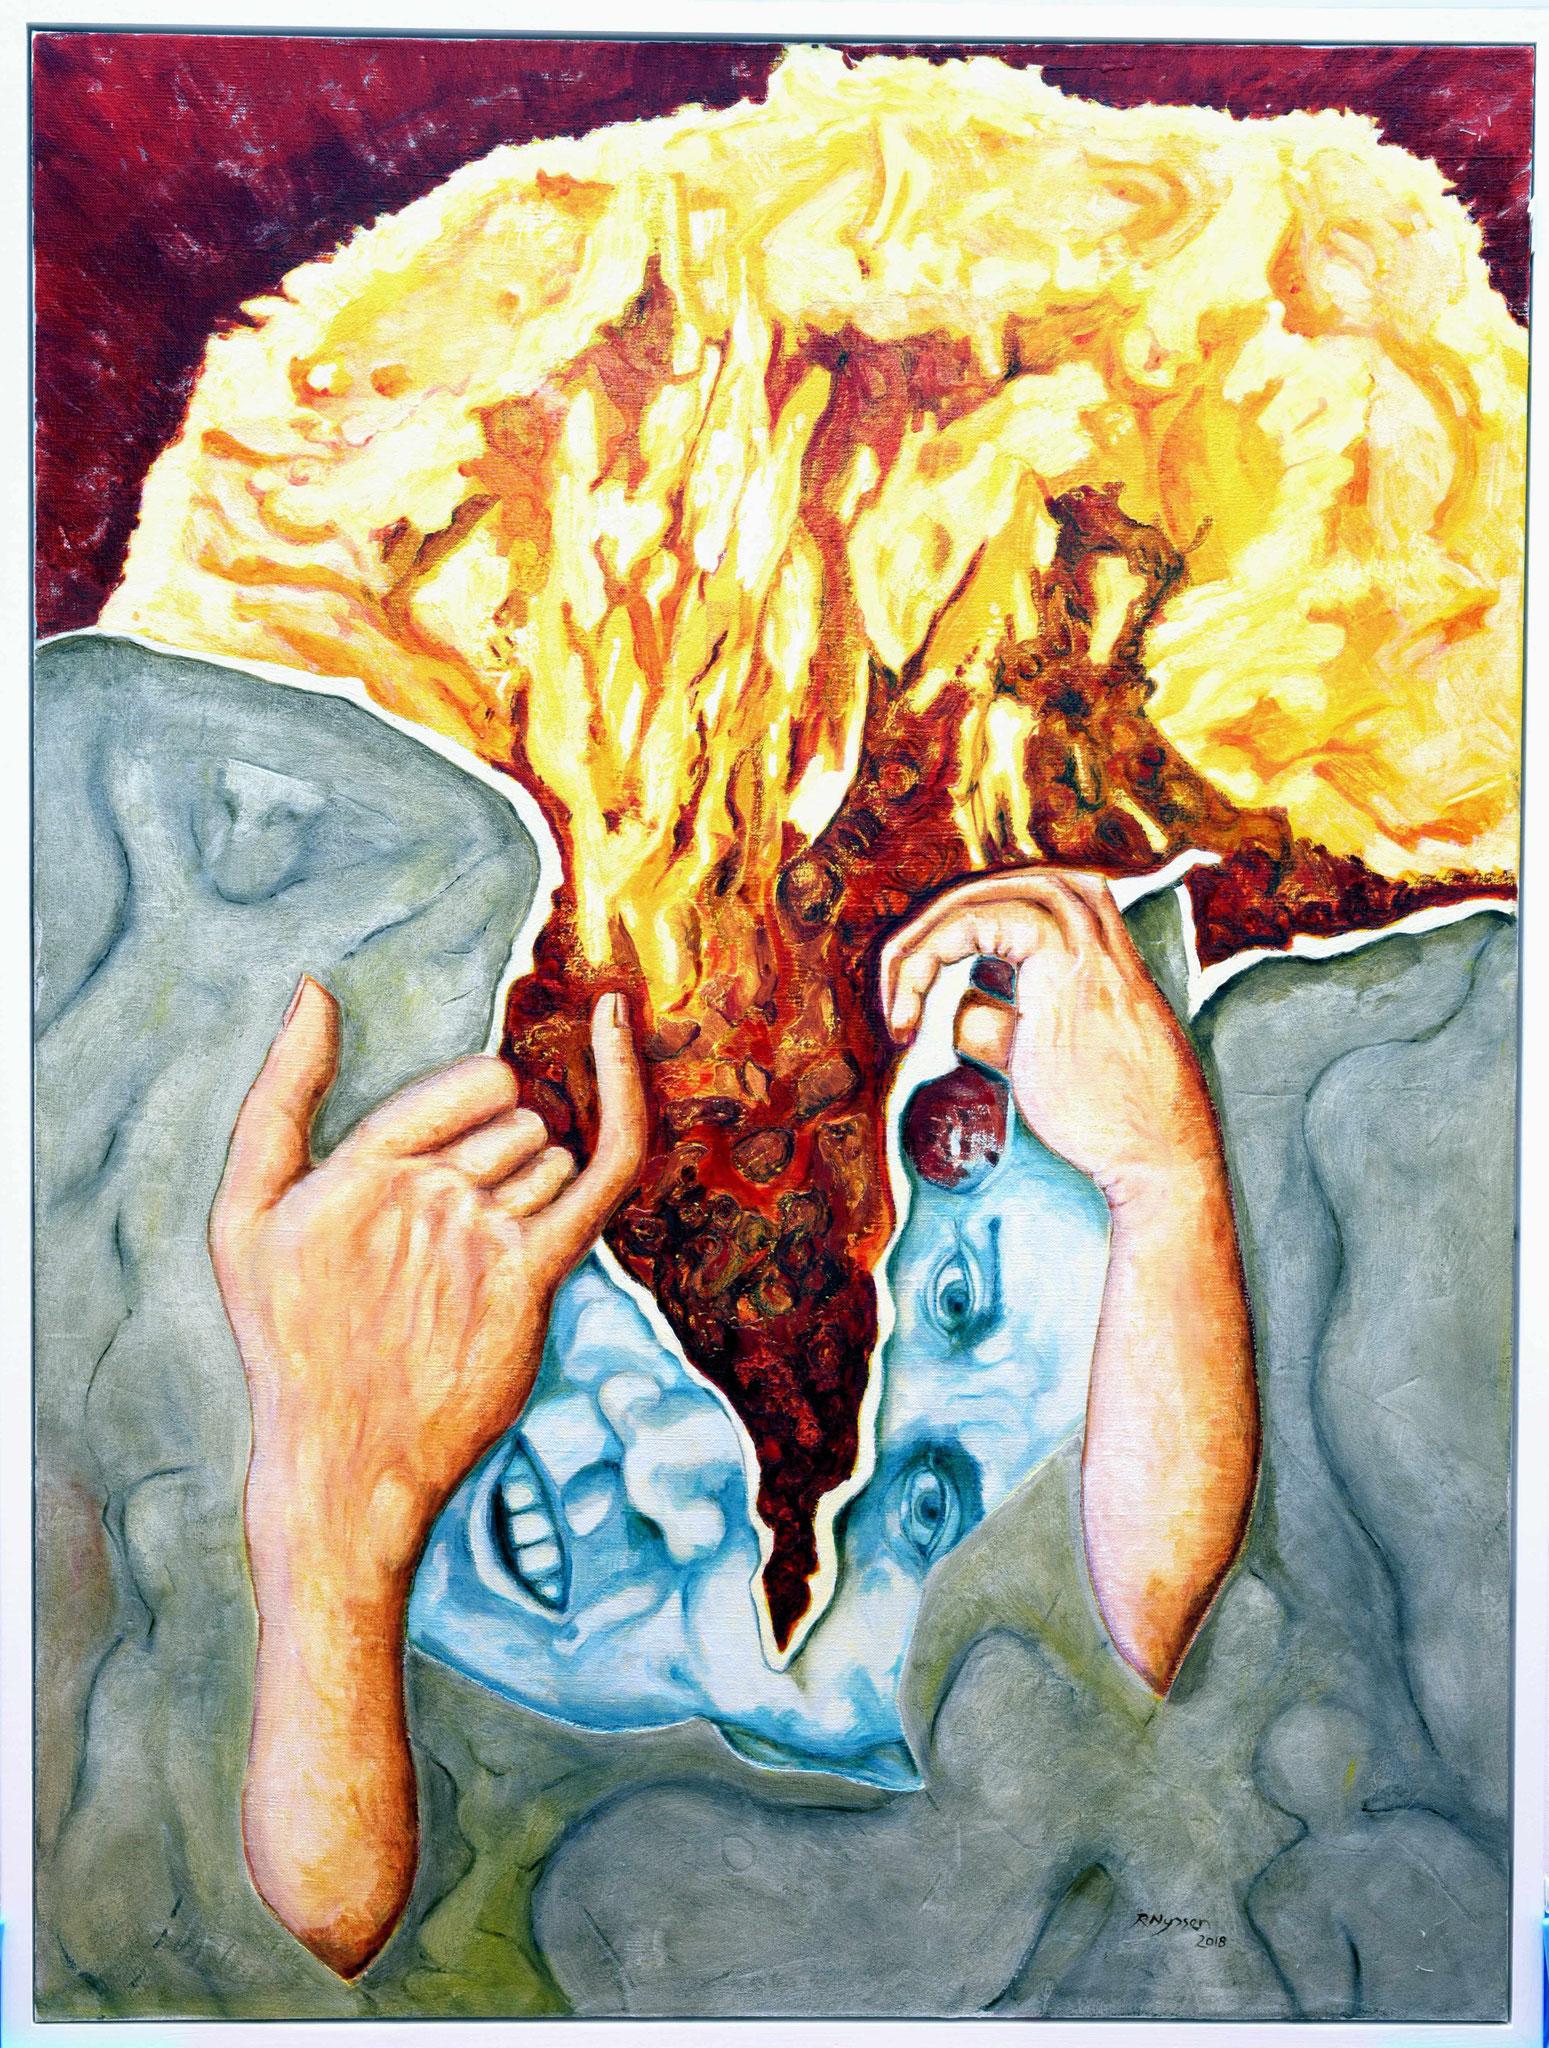 """Trisolaris III - Mentale Eskalation""-2018-Öl auf LW-160*120cm"